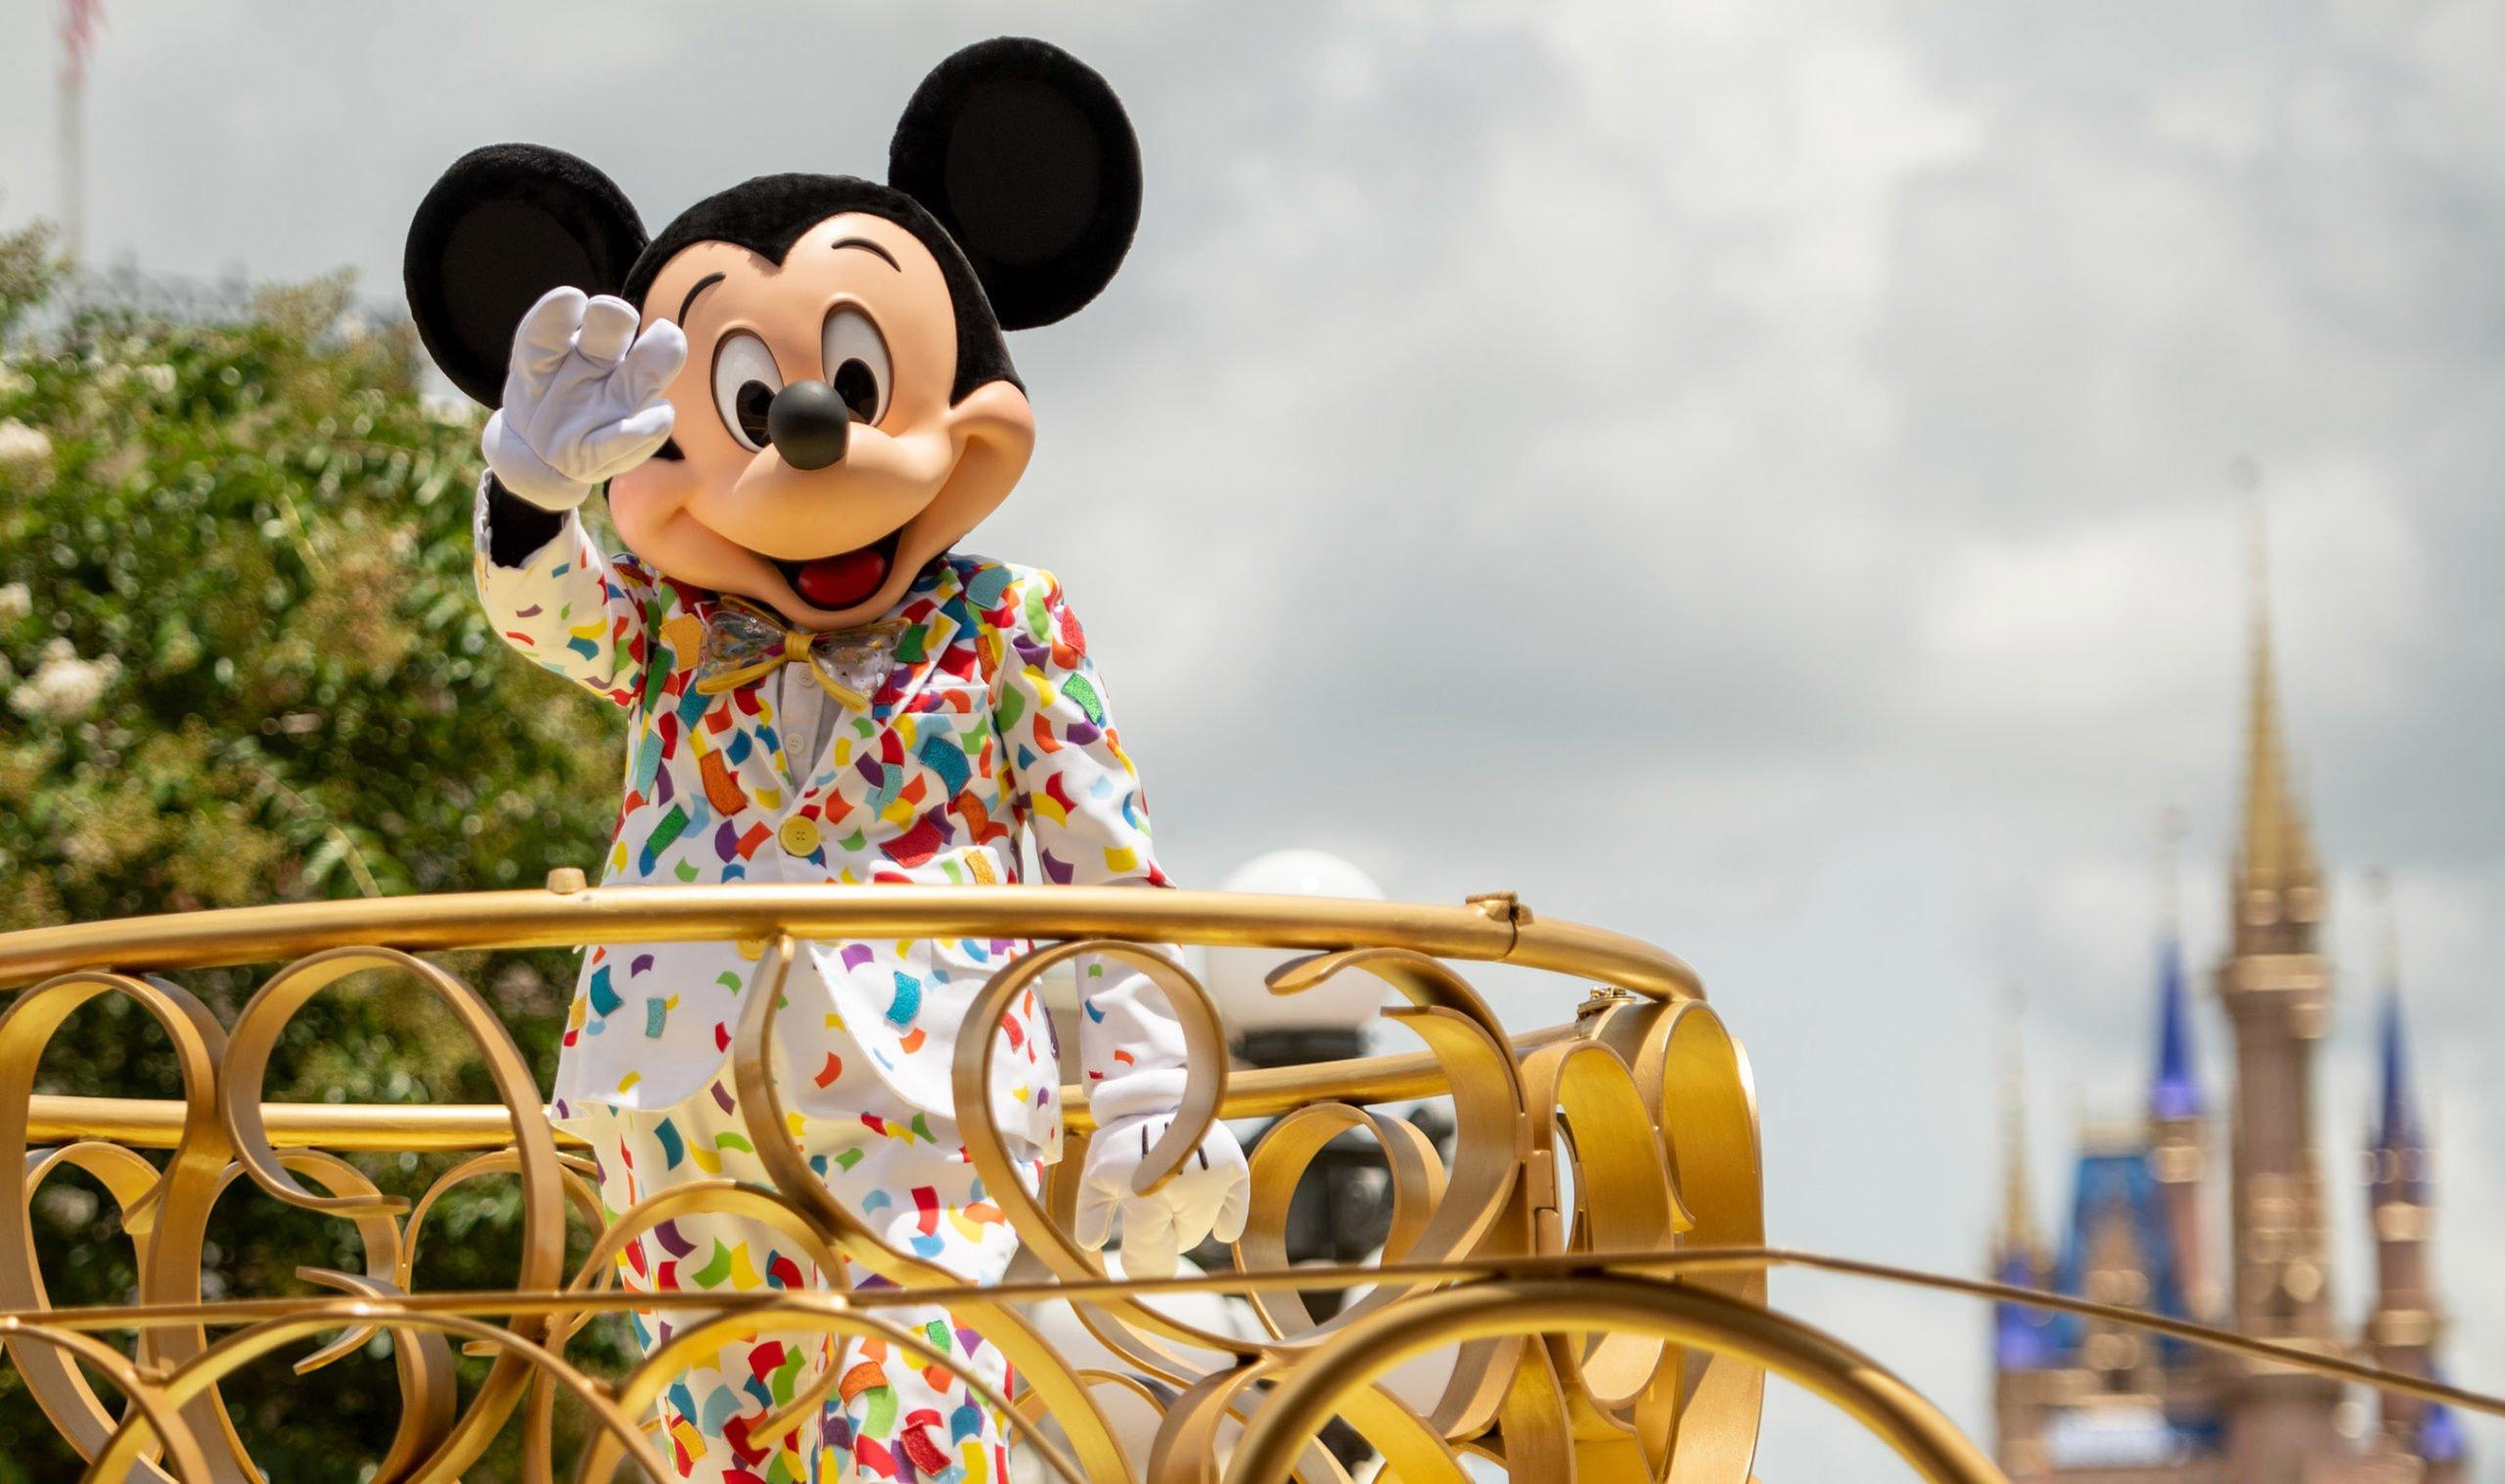 Mickey Mouse in parade at Magic Kingdom